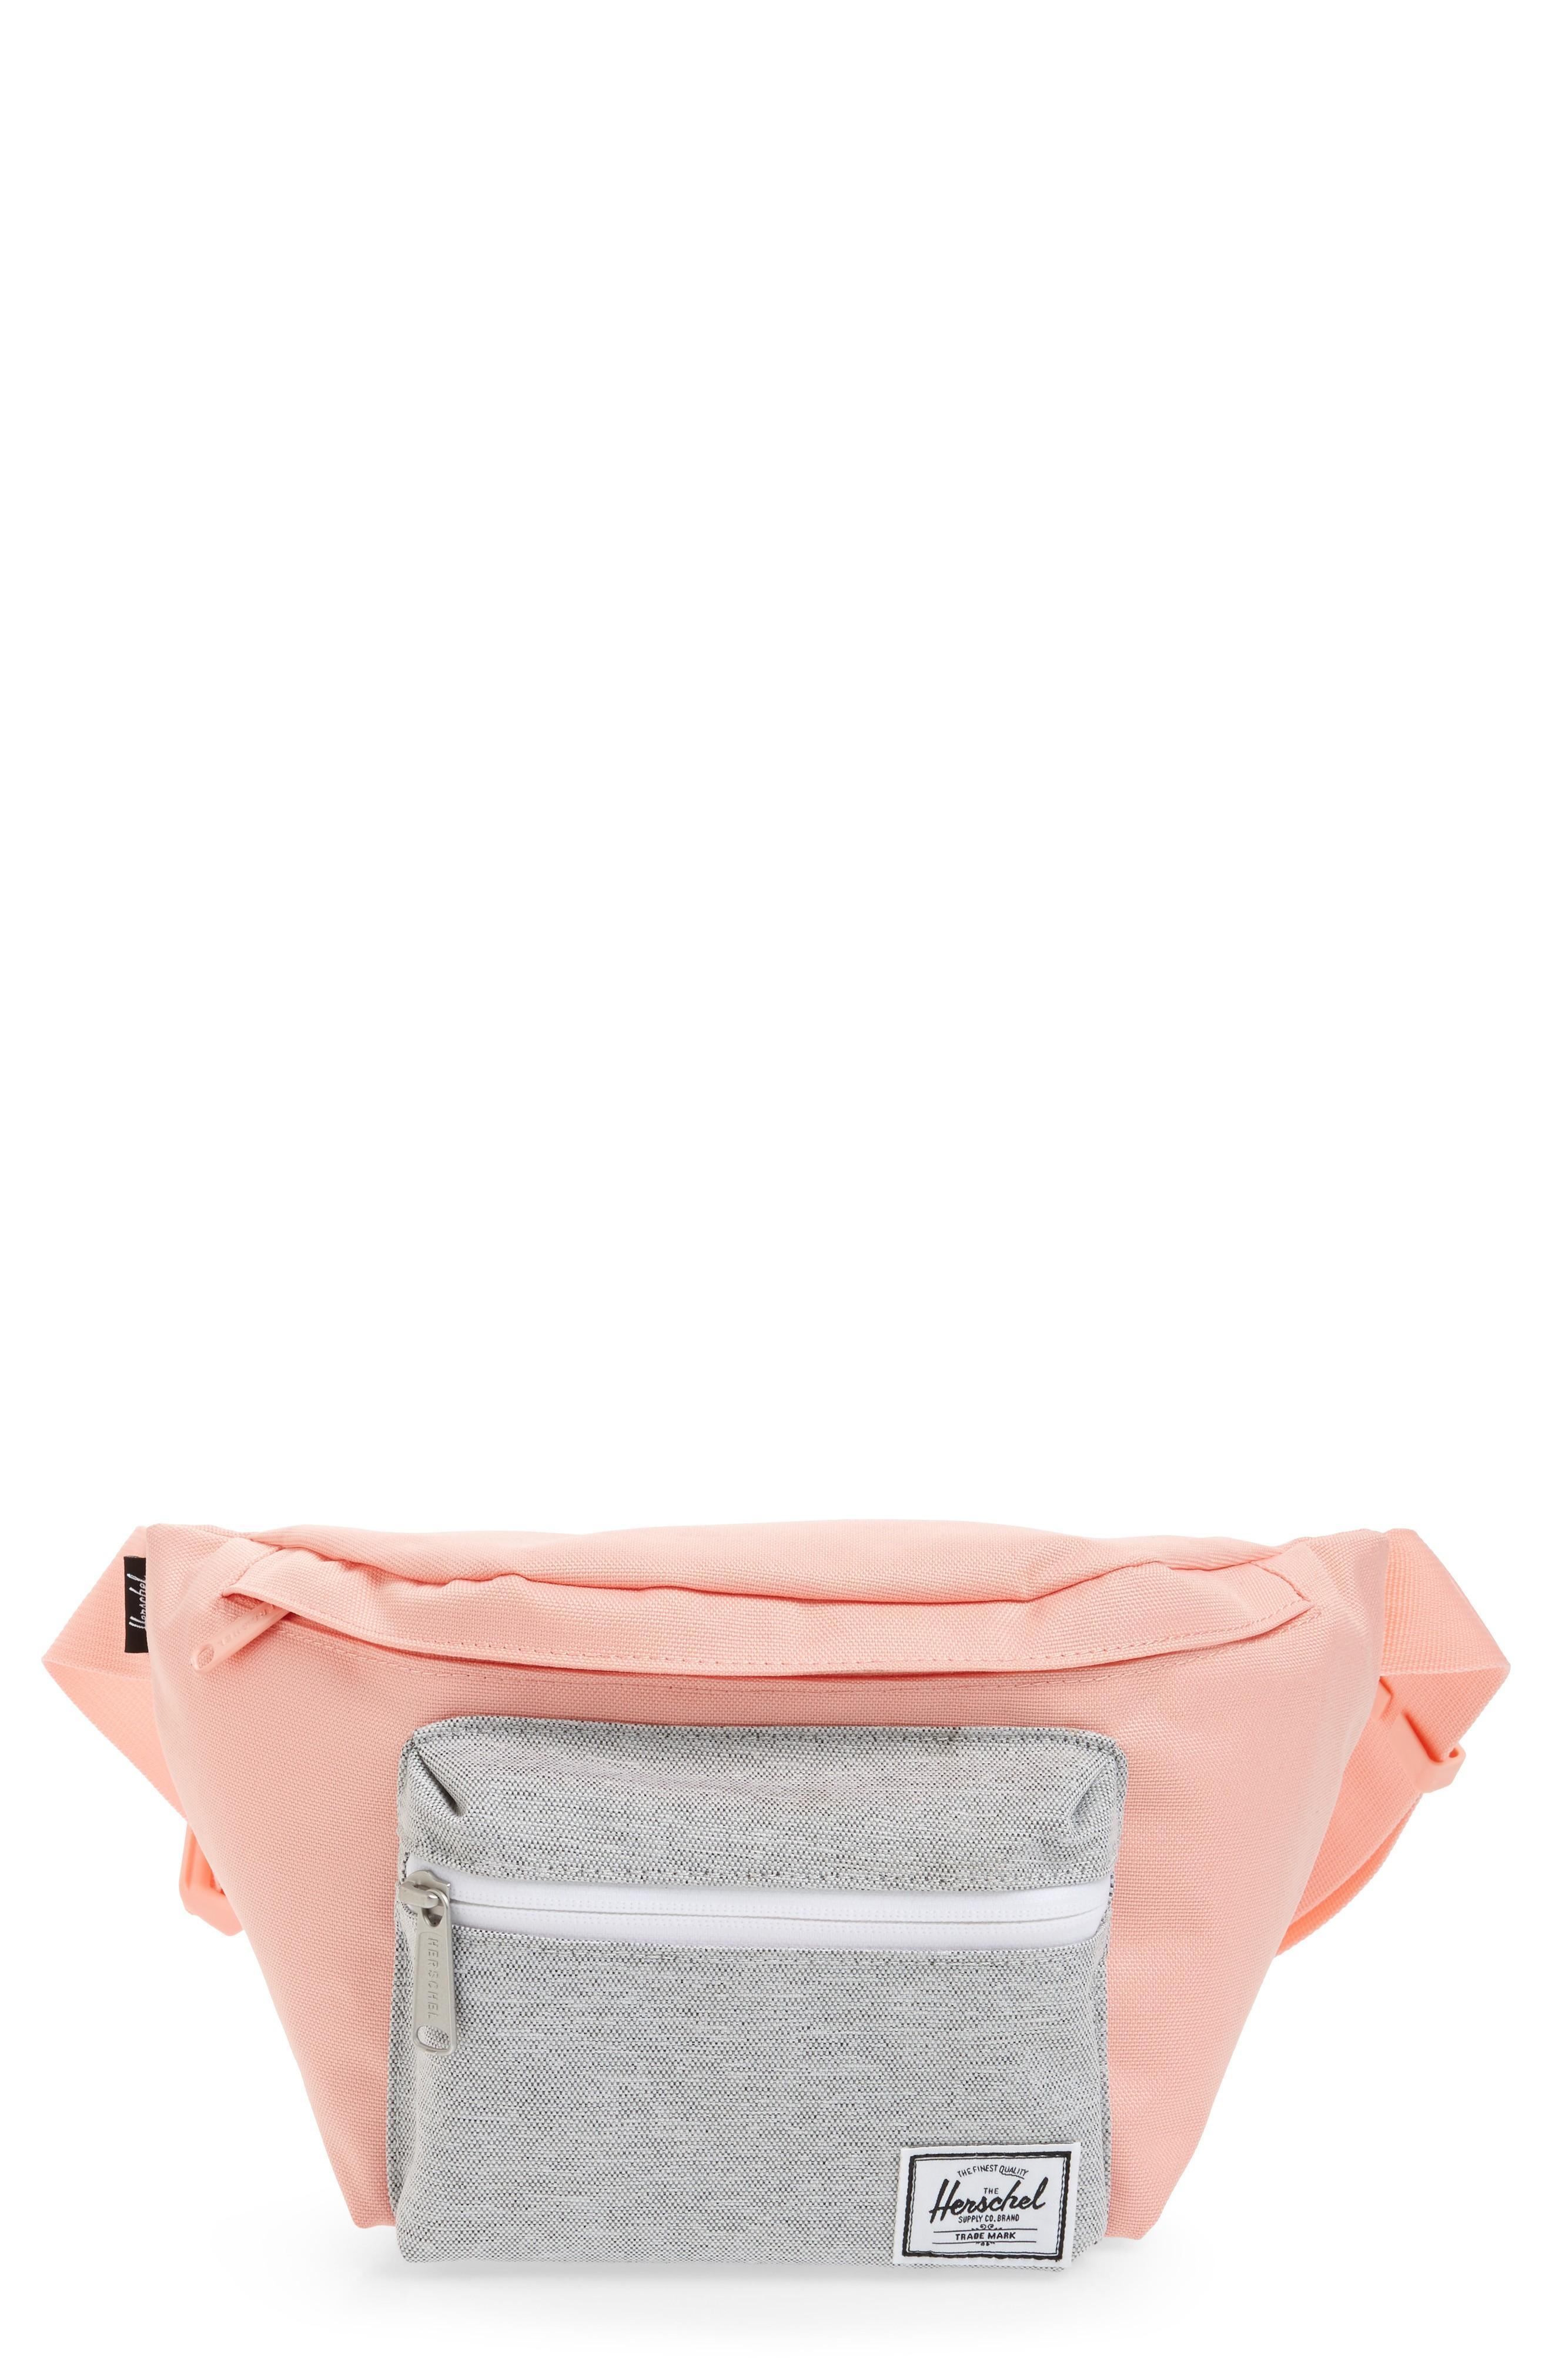 141651b91c9 Herschel Supply Co.  Seventeen  Belt Bag - Pink In Peach  Light Grey ...